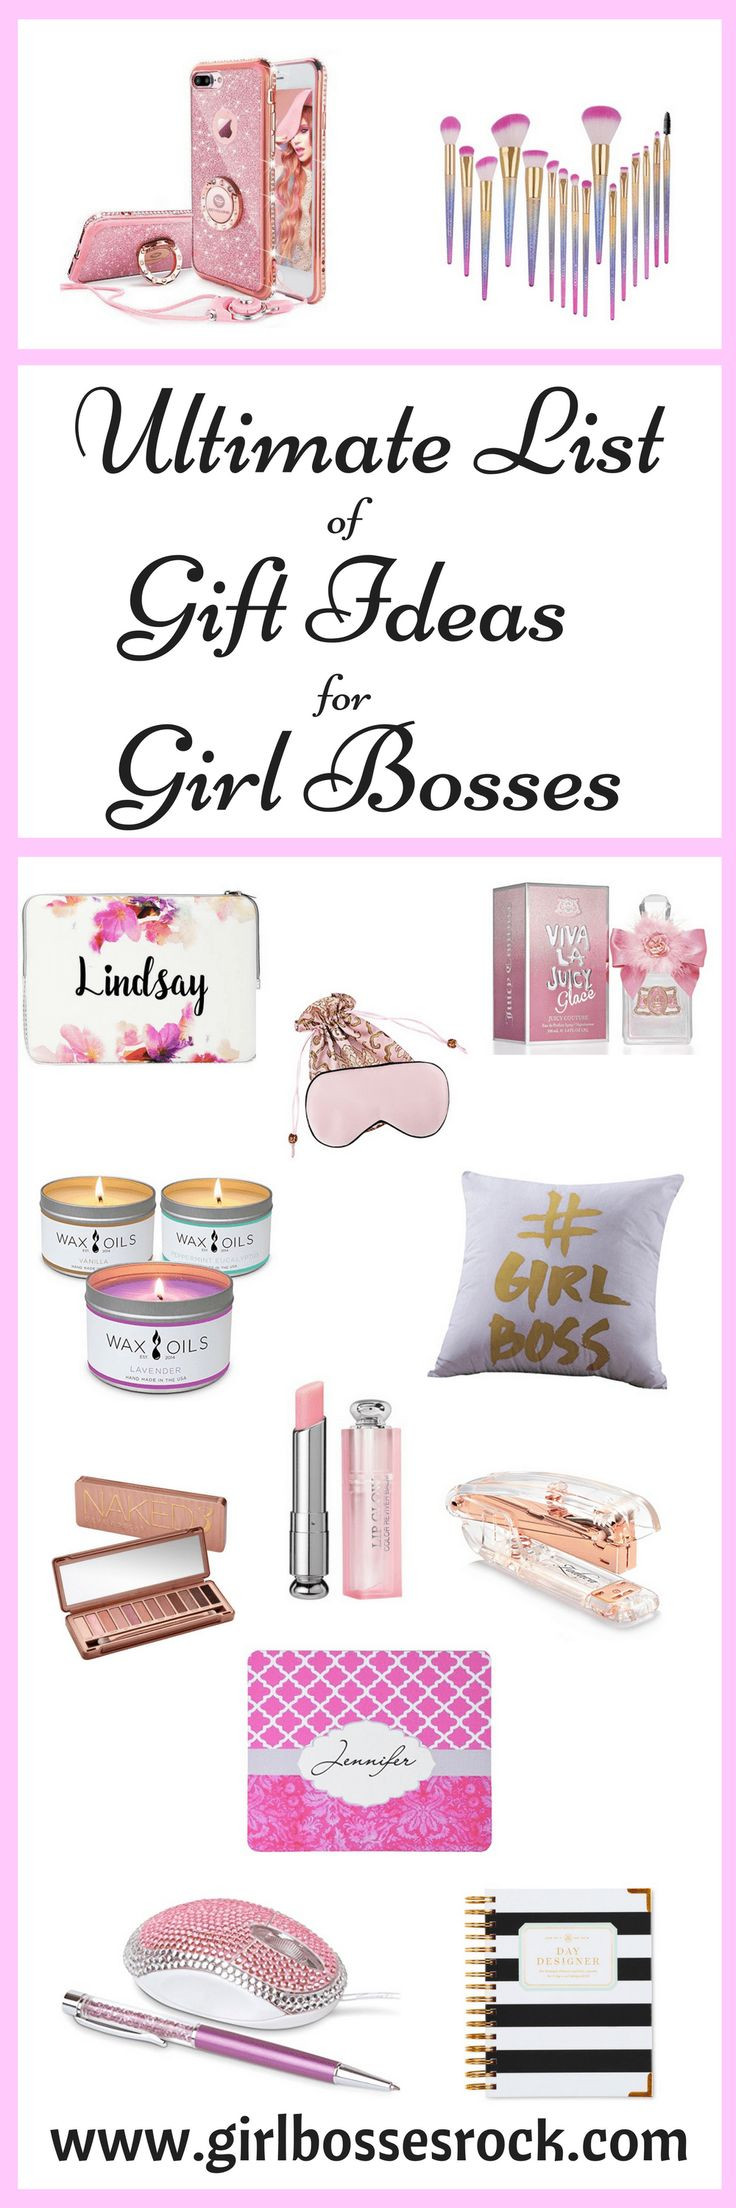 Best ideas about Boss Gift Ideas . Save or Pin Best 25 Boss ts ideas on Pinterest Now.